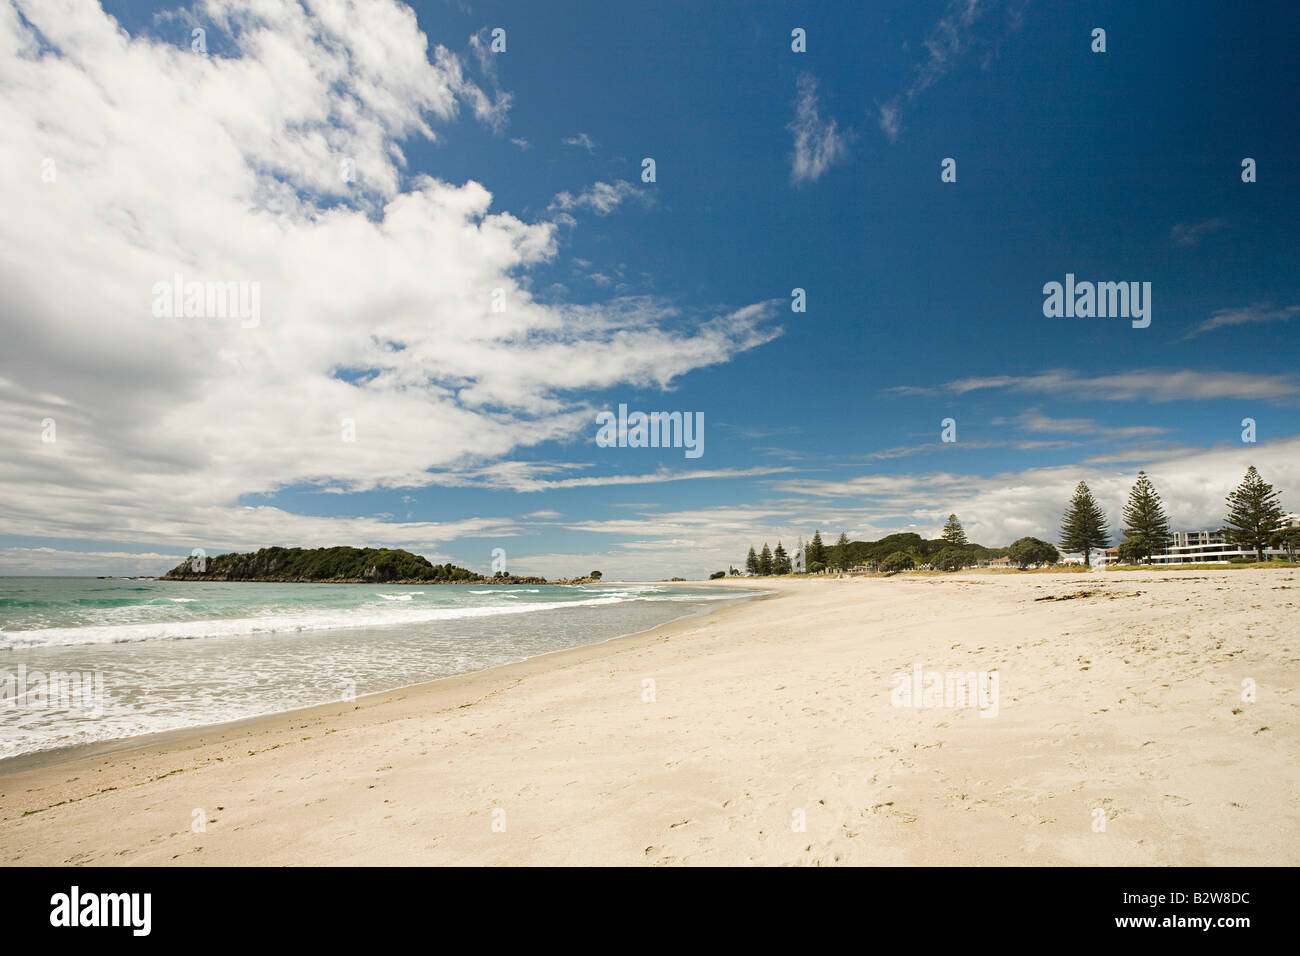 A beach on north island Stock Photo